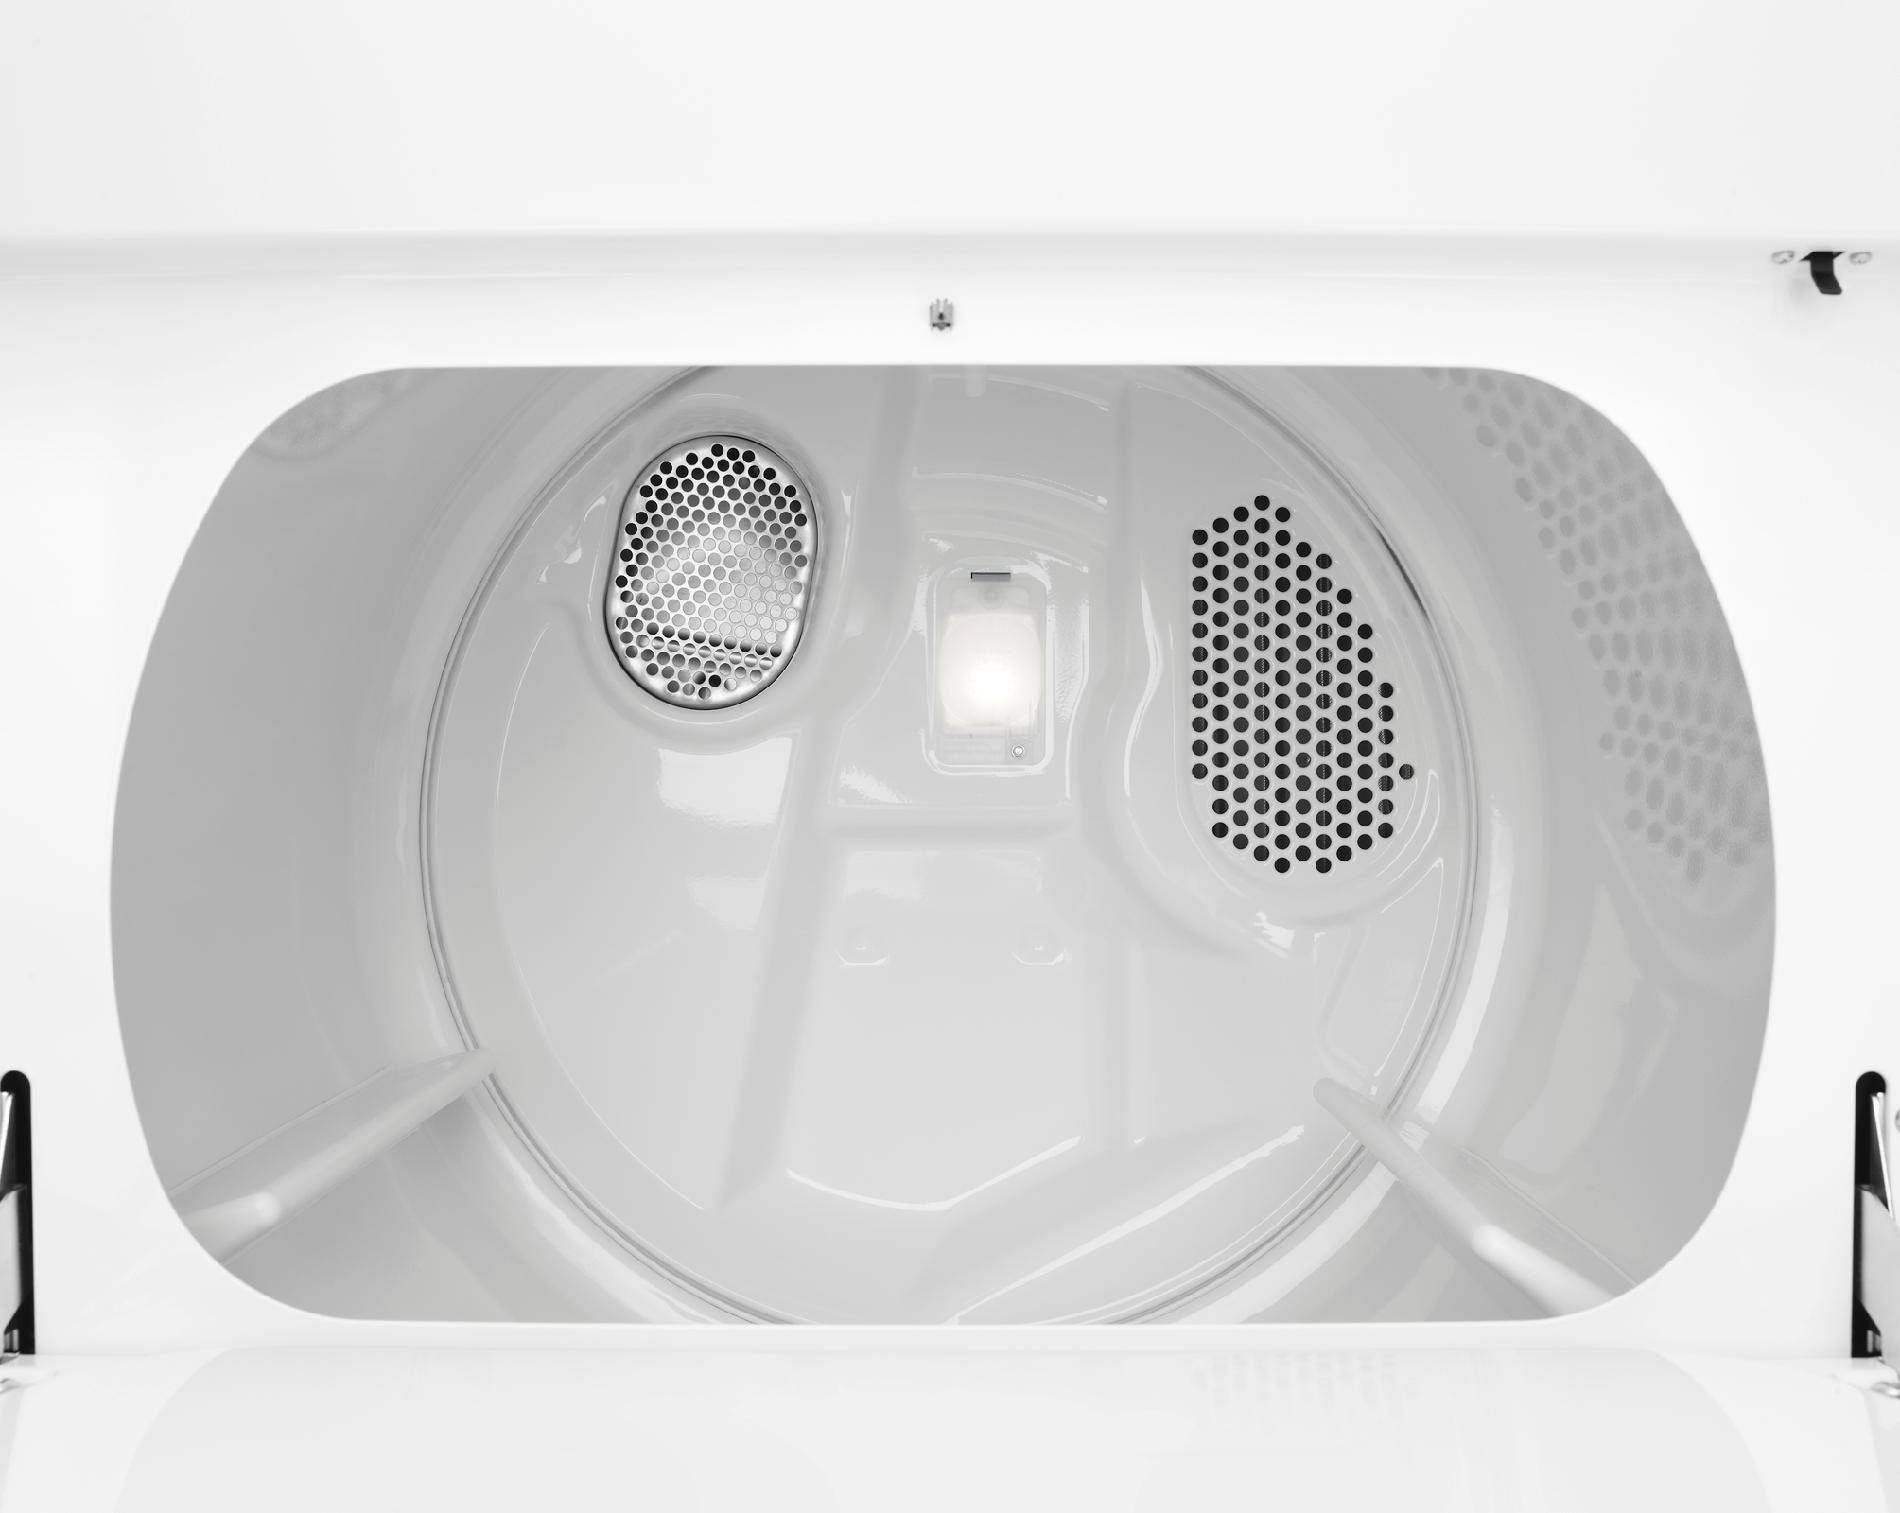 Whirlpool 7.0 cu. ft. Gas Dryer w/ Wrinkle Shield™ Option - White